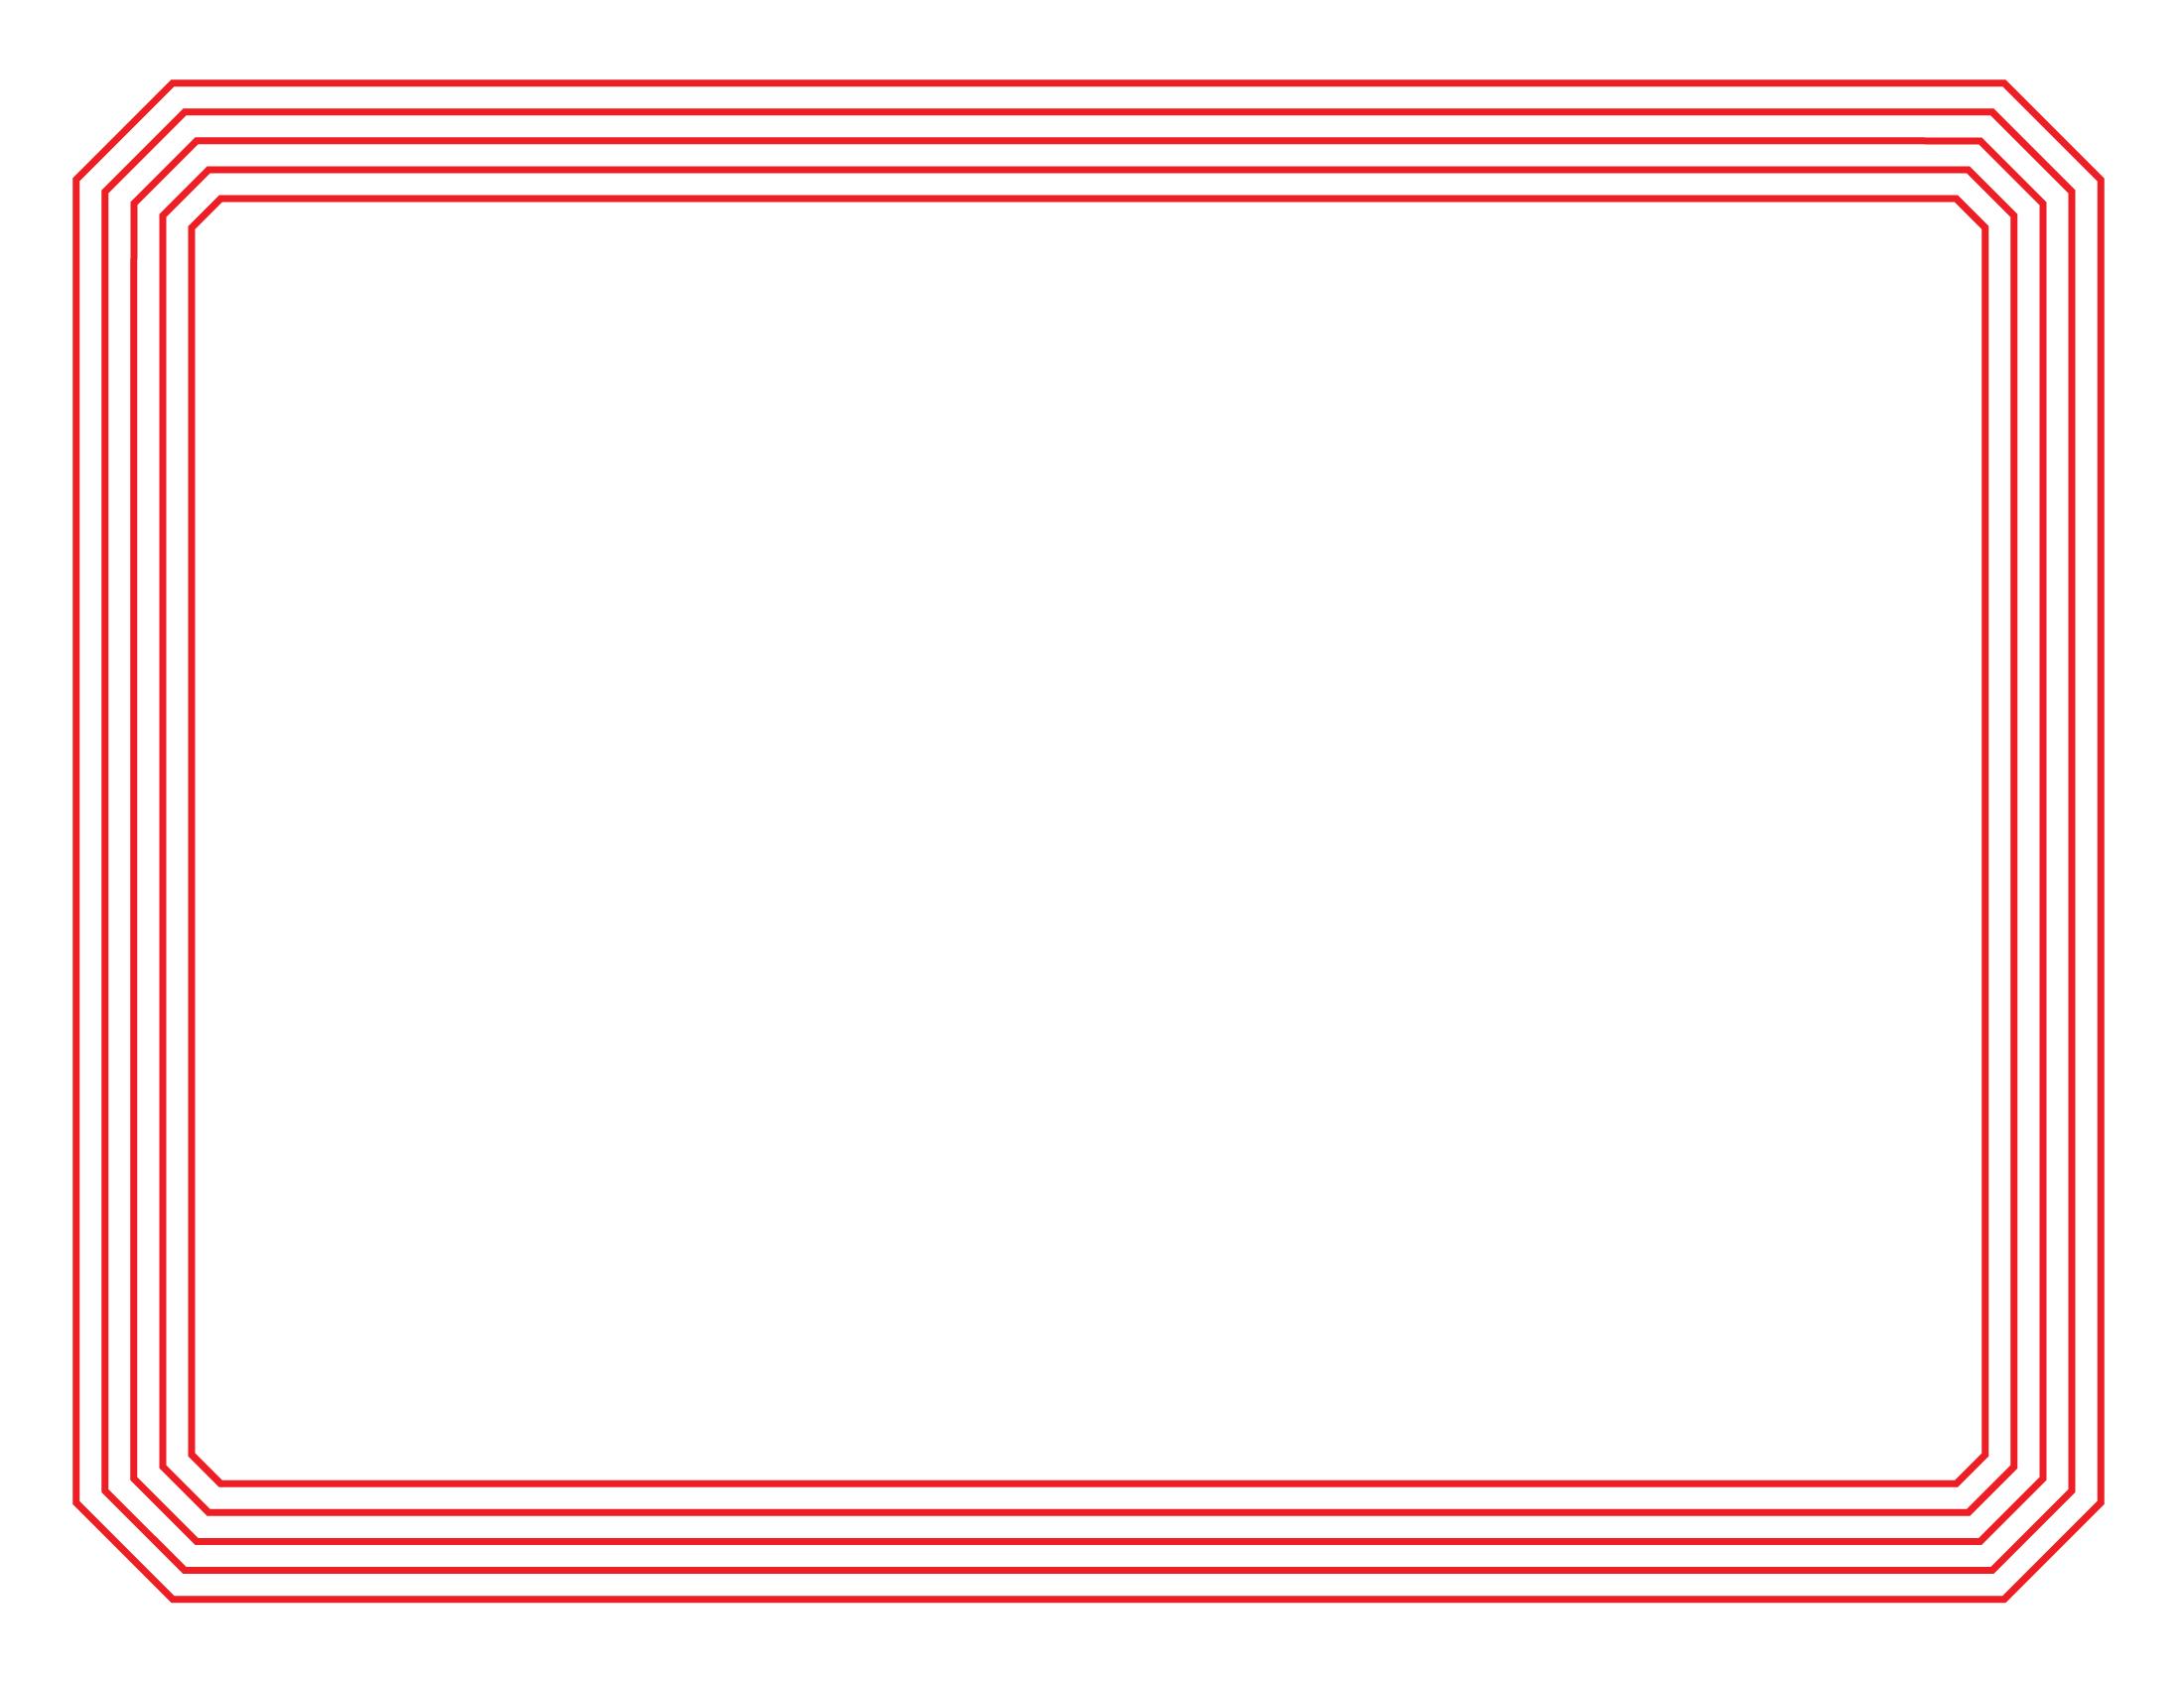 Resume borders on word – Microsoft Office Borders Templates